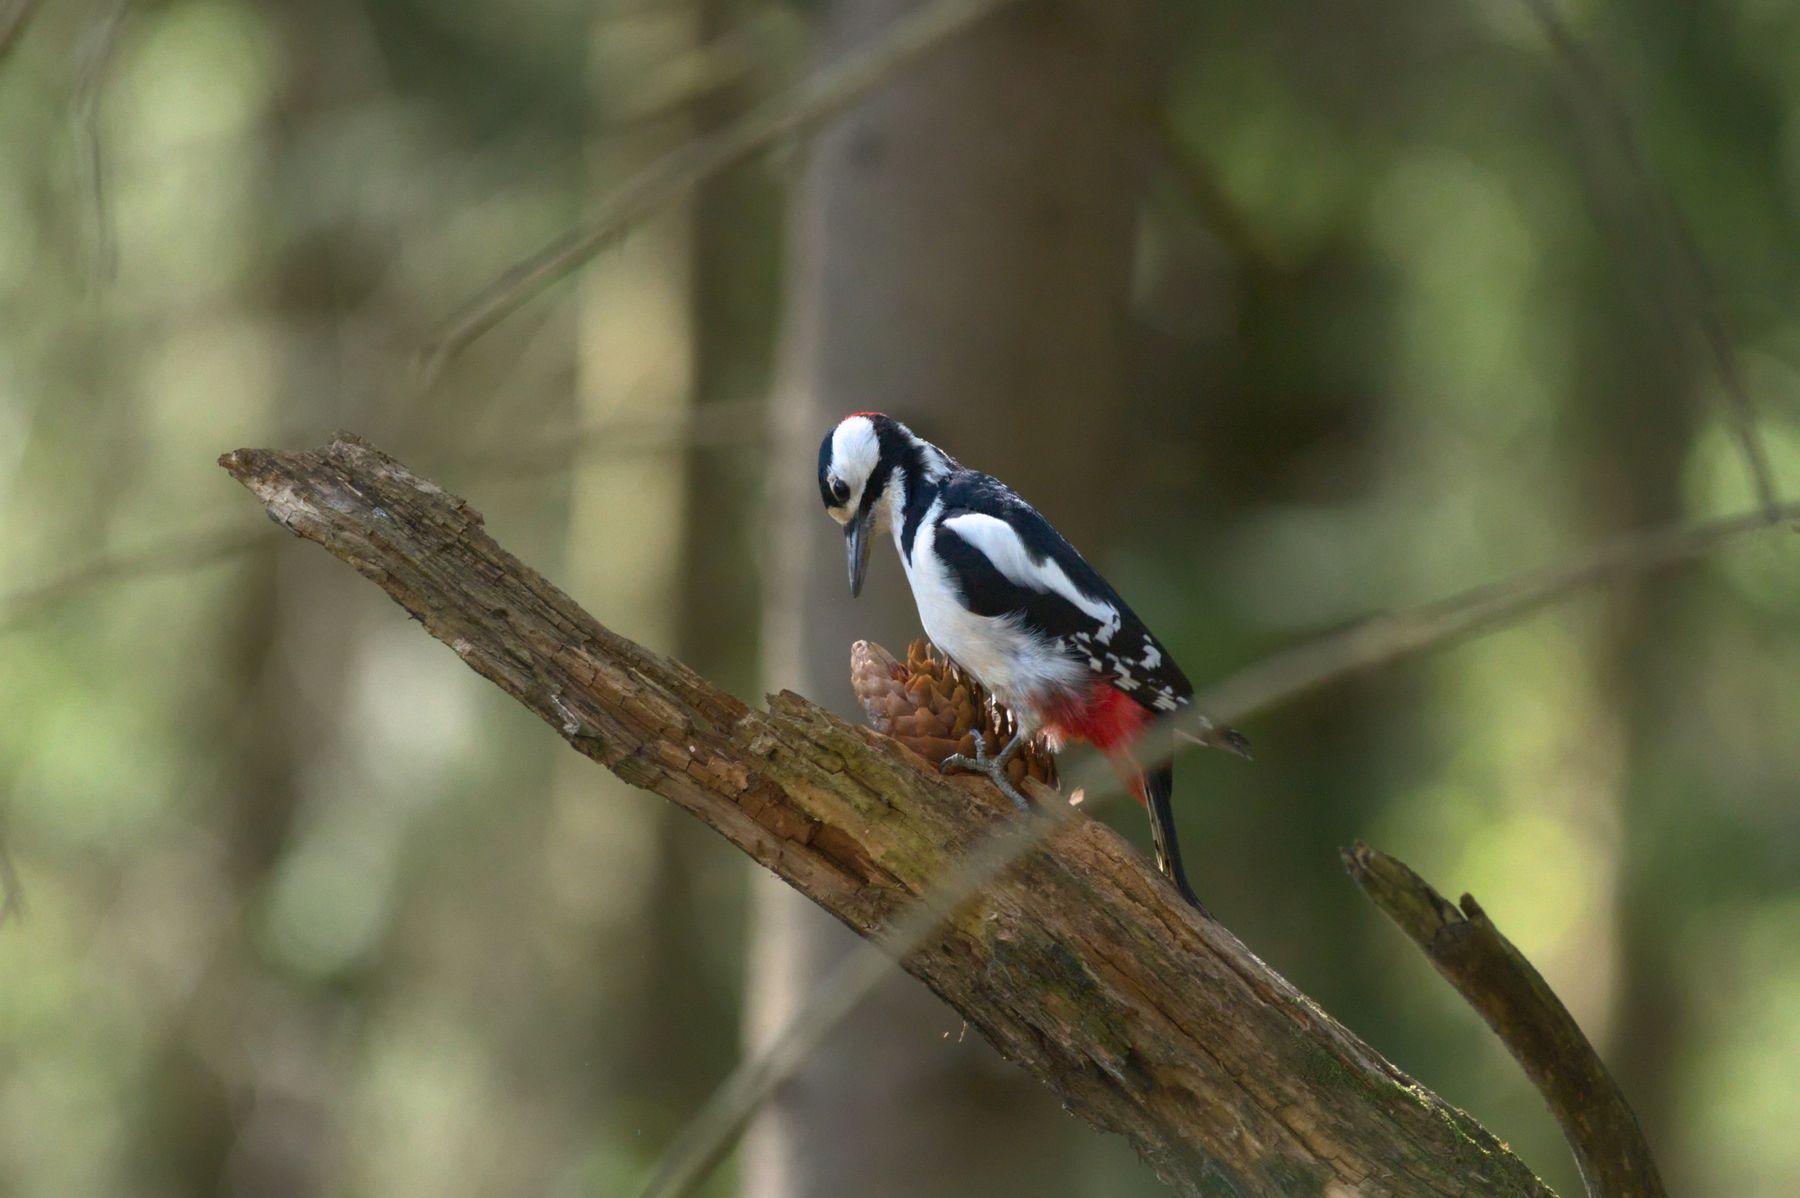 Кузница пёстрого дятла пёстрый дятел кузница дятла фотоохота птицы great spotted woodpecker Dendrocopus major